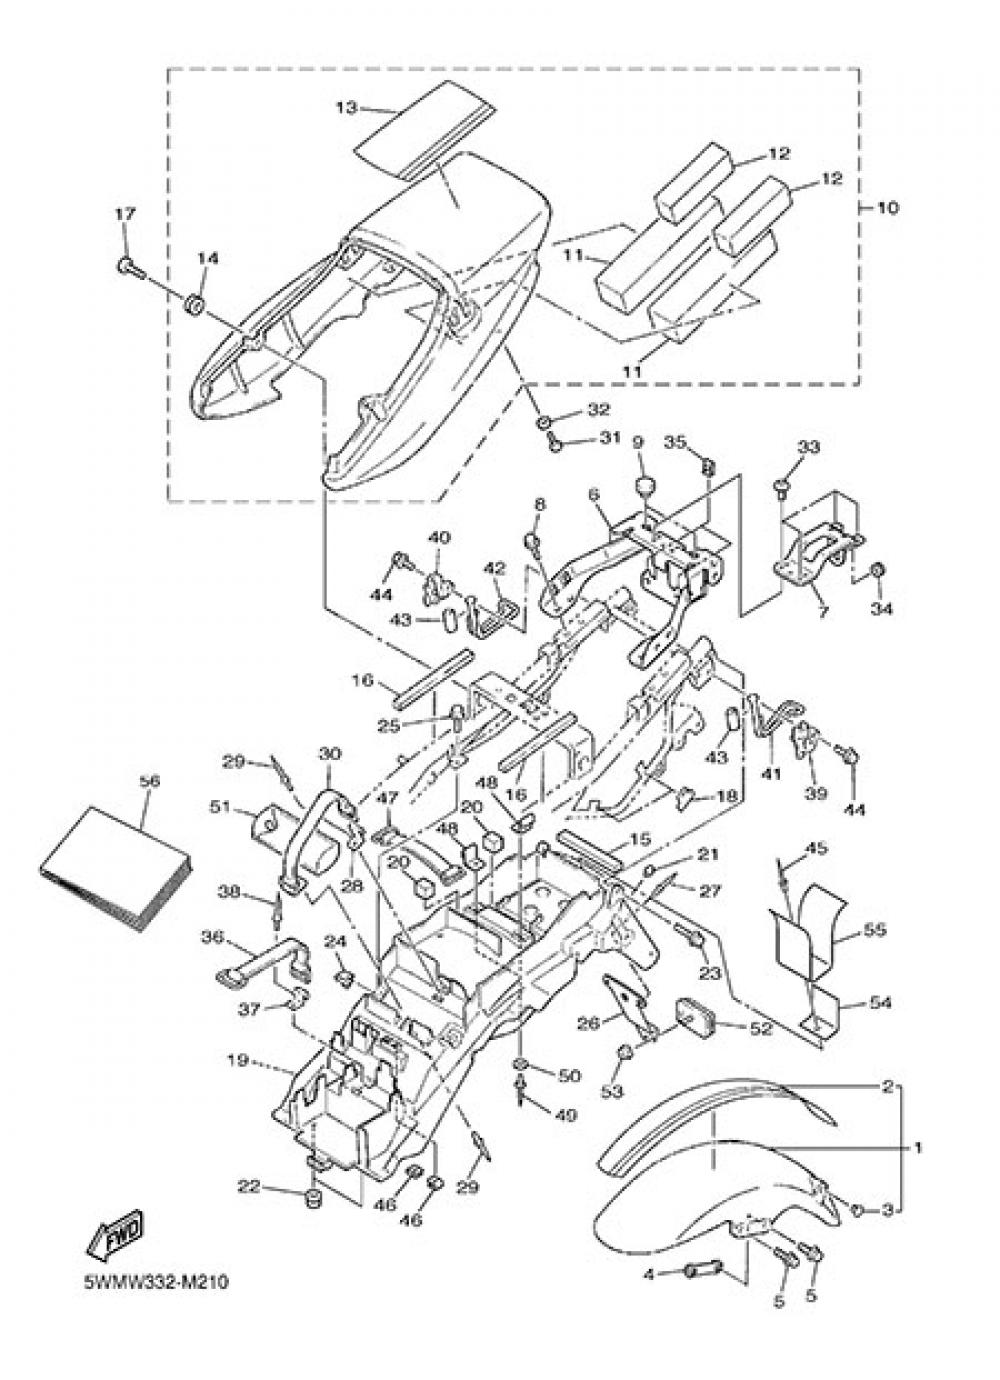 FENDER Yamaha XJR 1300 2013